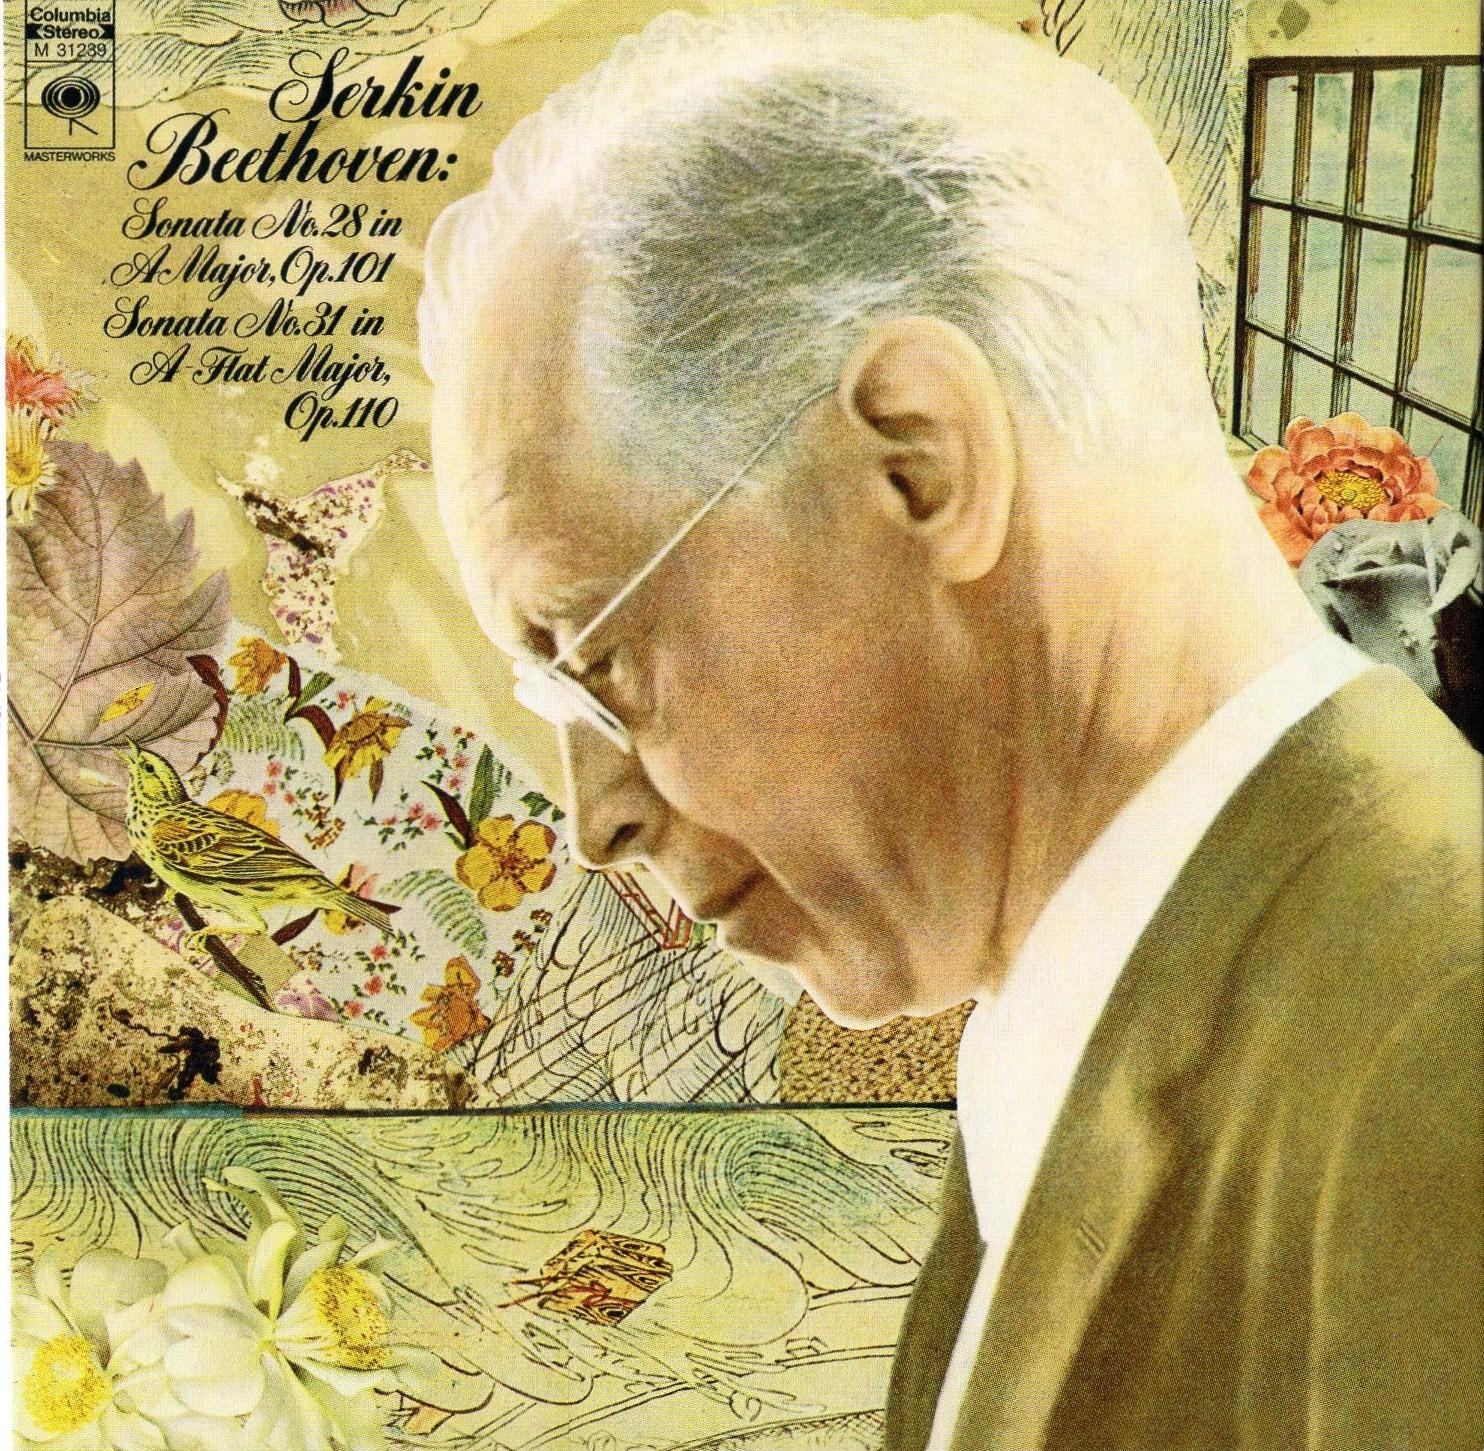 Rudolf Serkin - The Complete Columbia Album Collection CD58